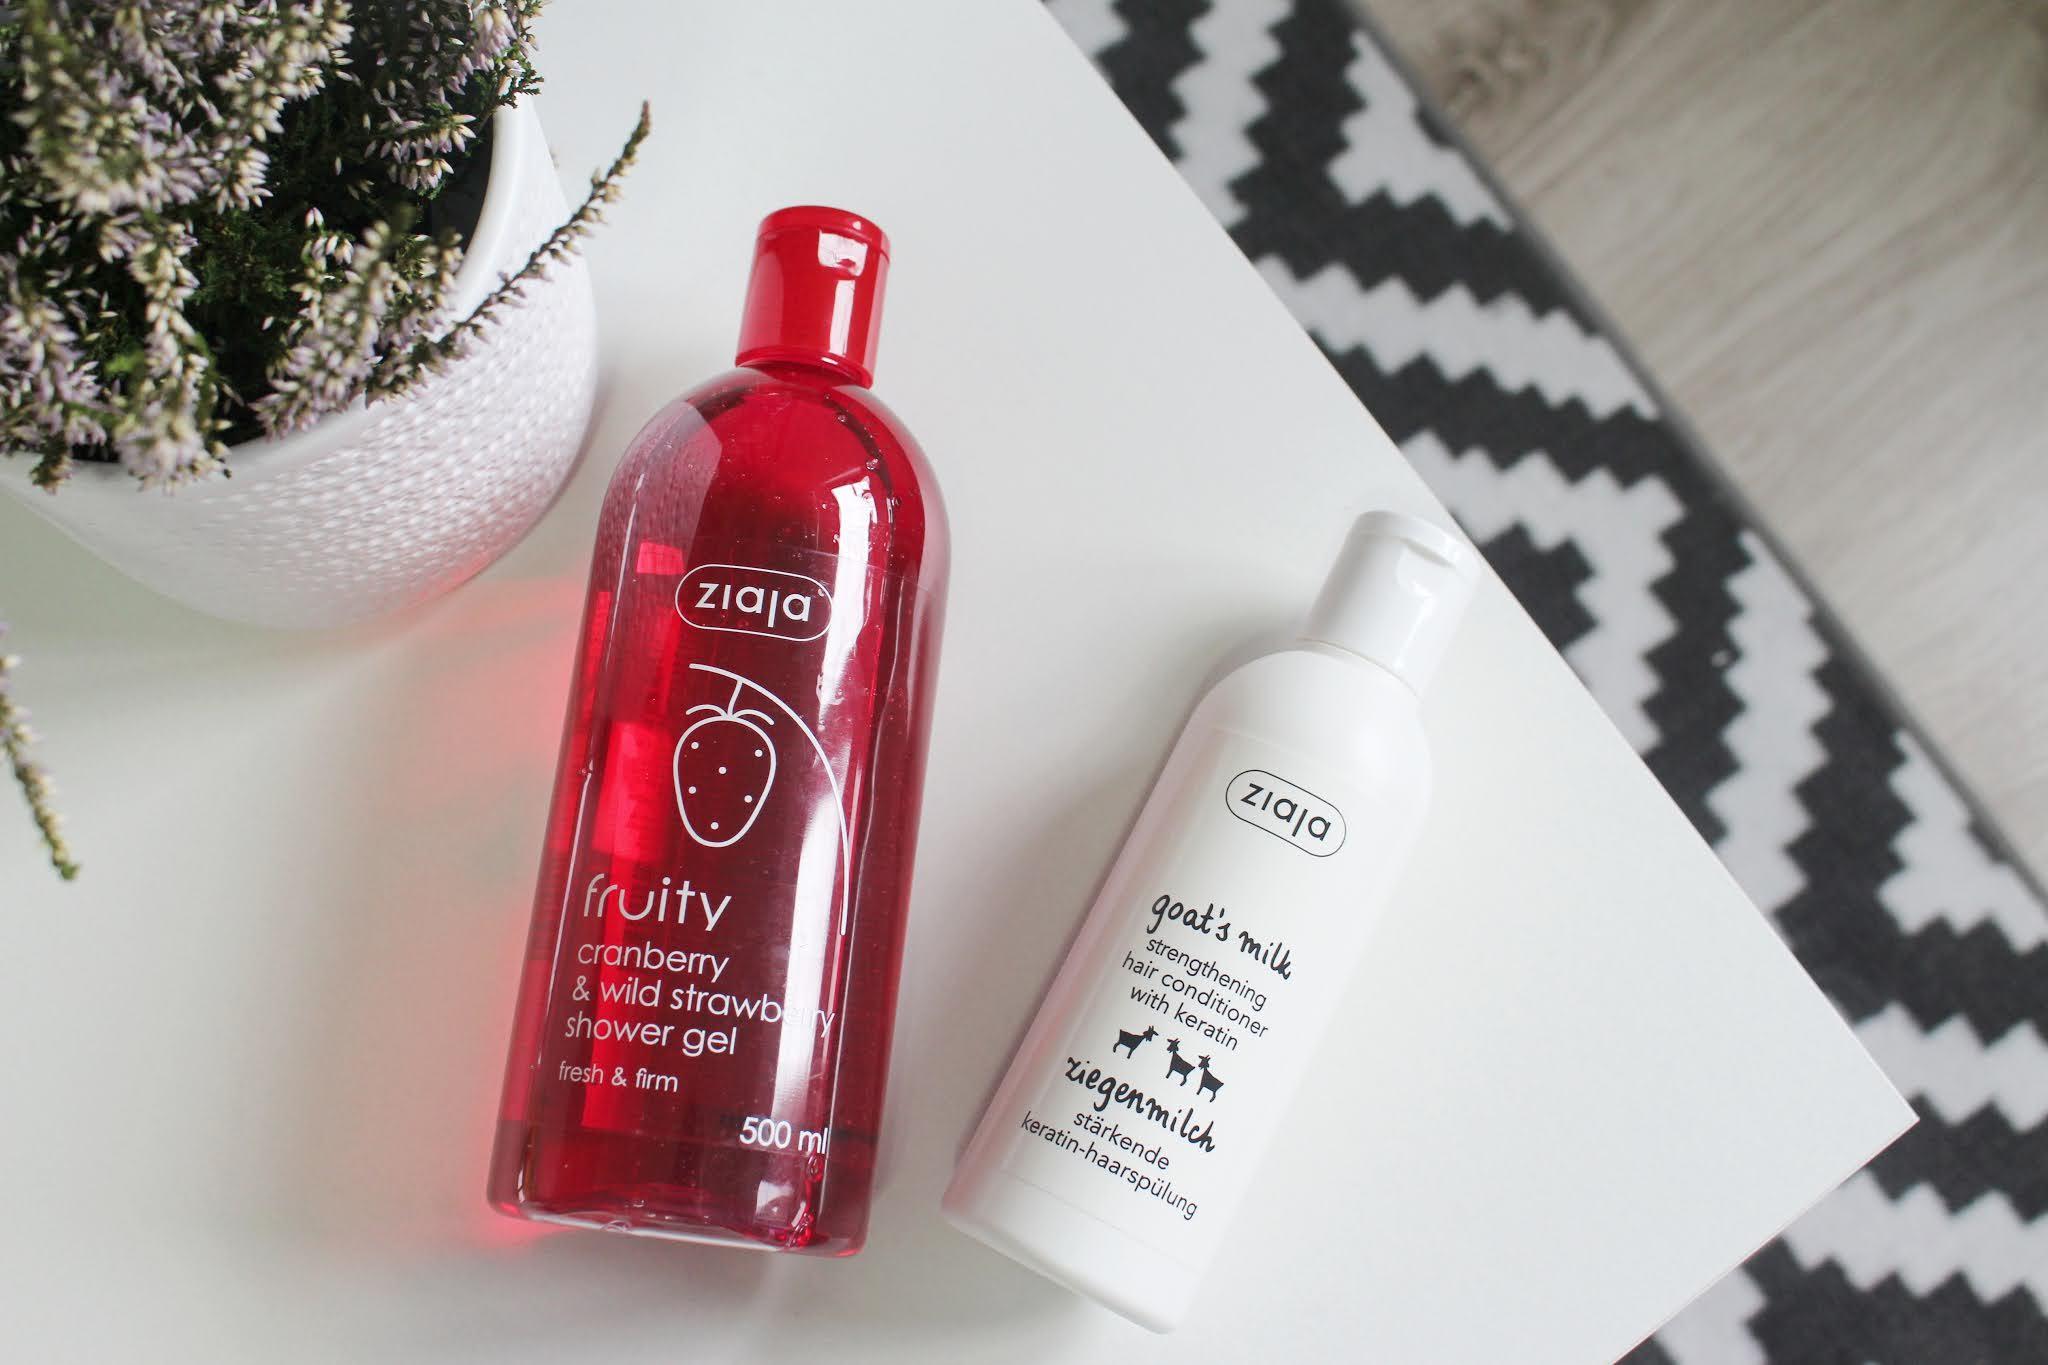 Ziaja, review, shower gel, beauty, notino, blogger, blog, recenzia, kozmetika, blogerka